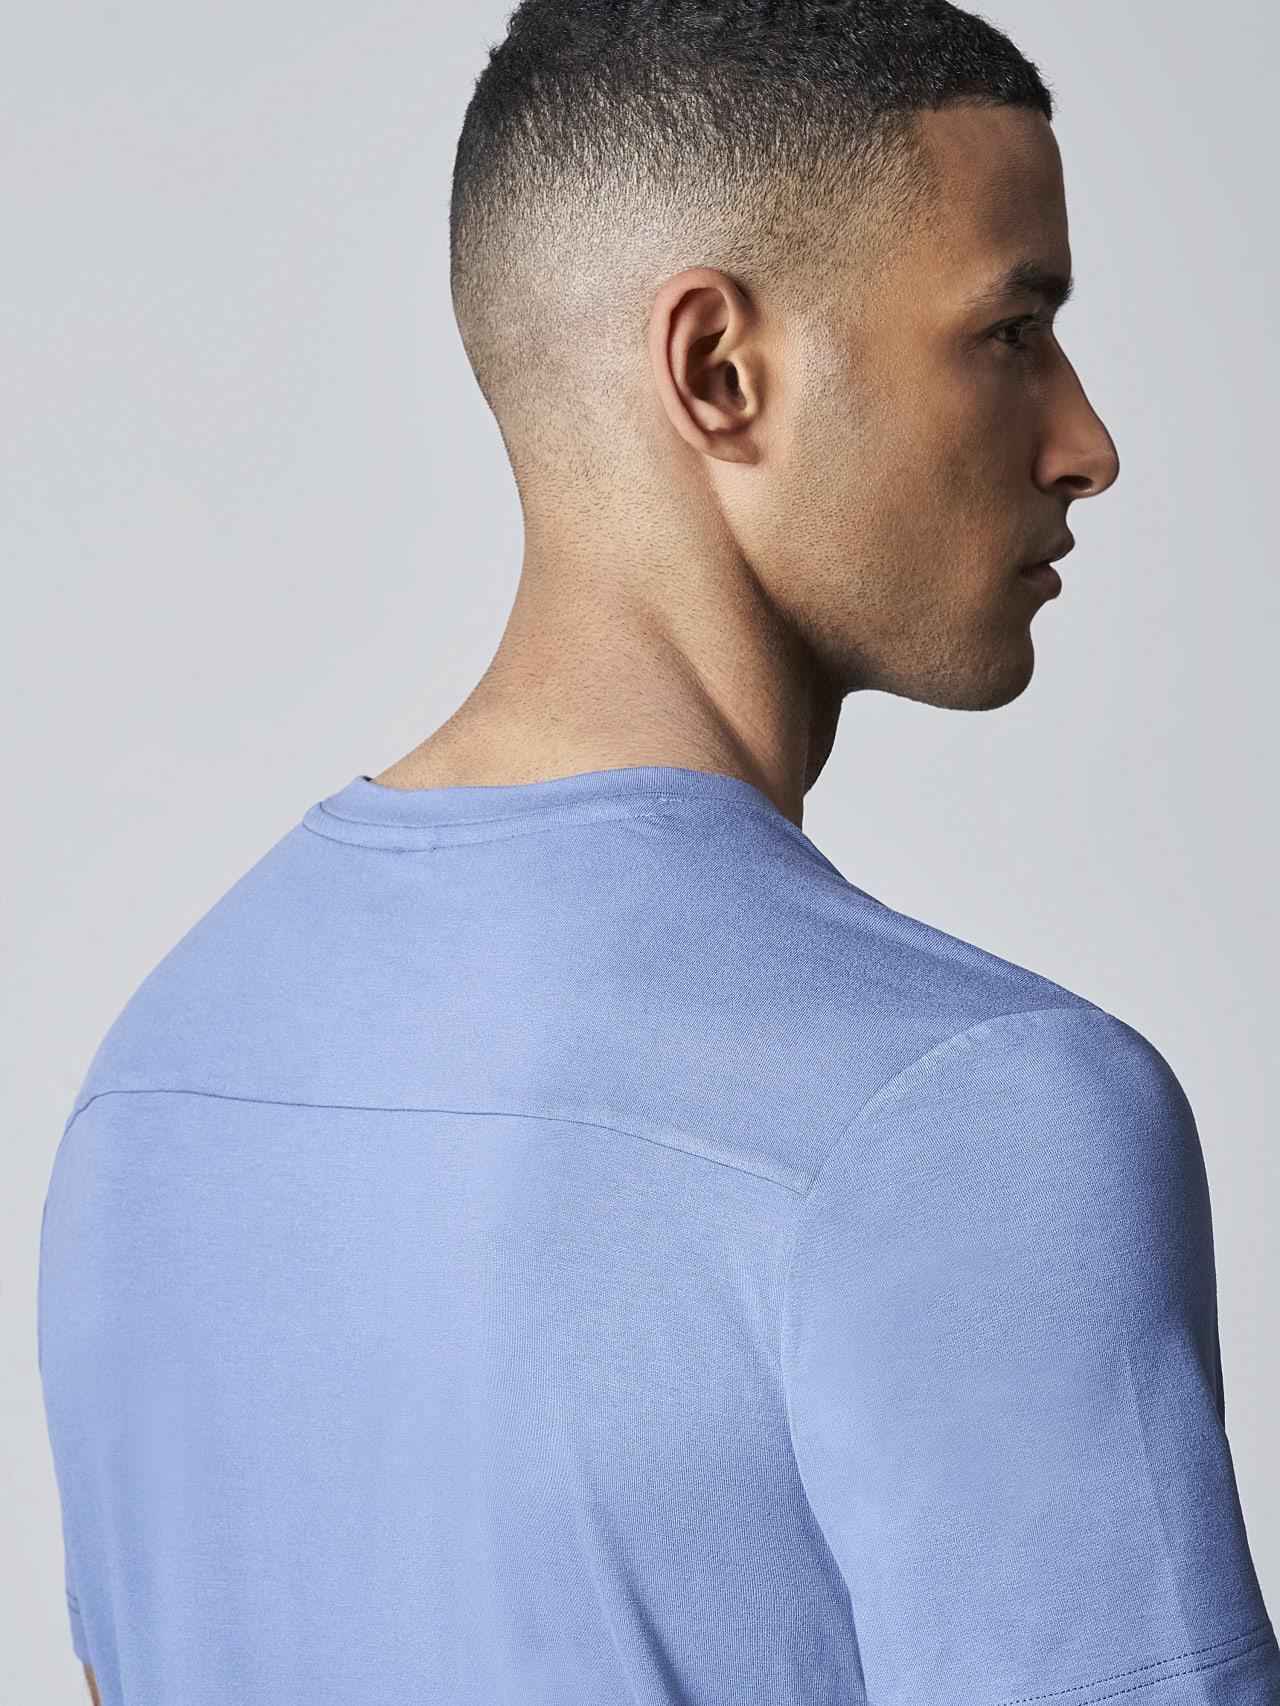 JANUE V1.Y5.02 Viscose T-Shirt light blue Extra Alpha Tauri